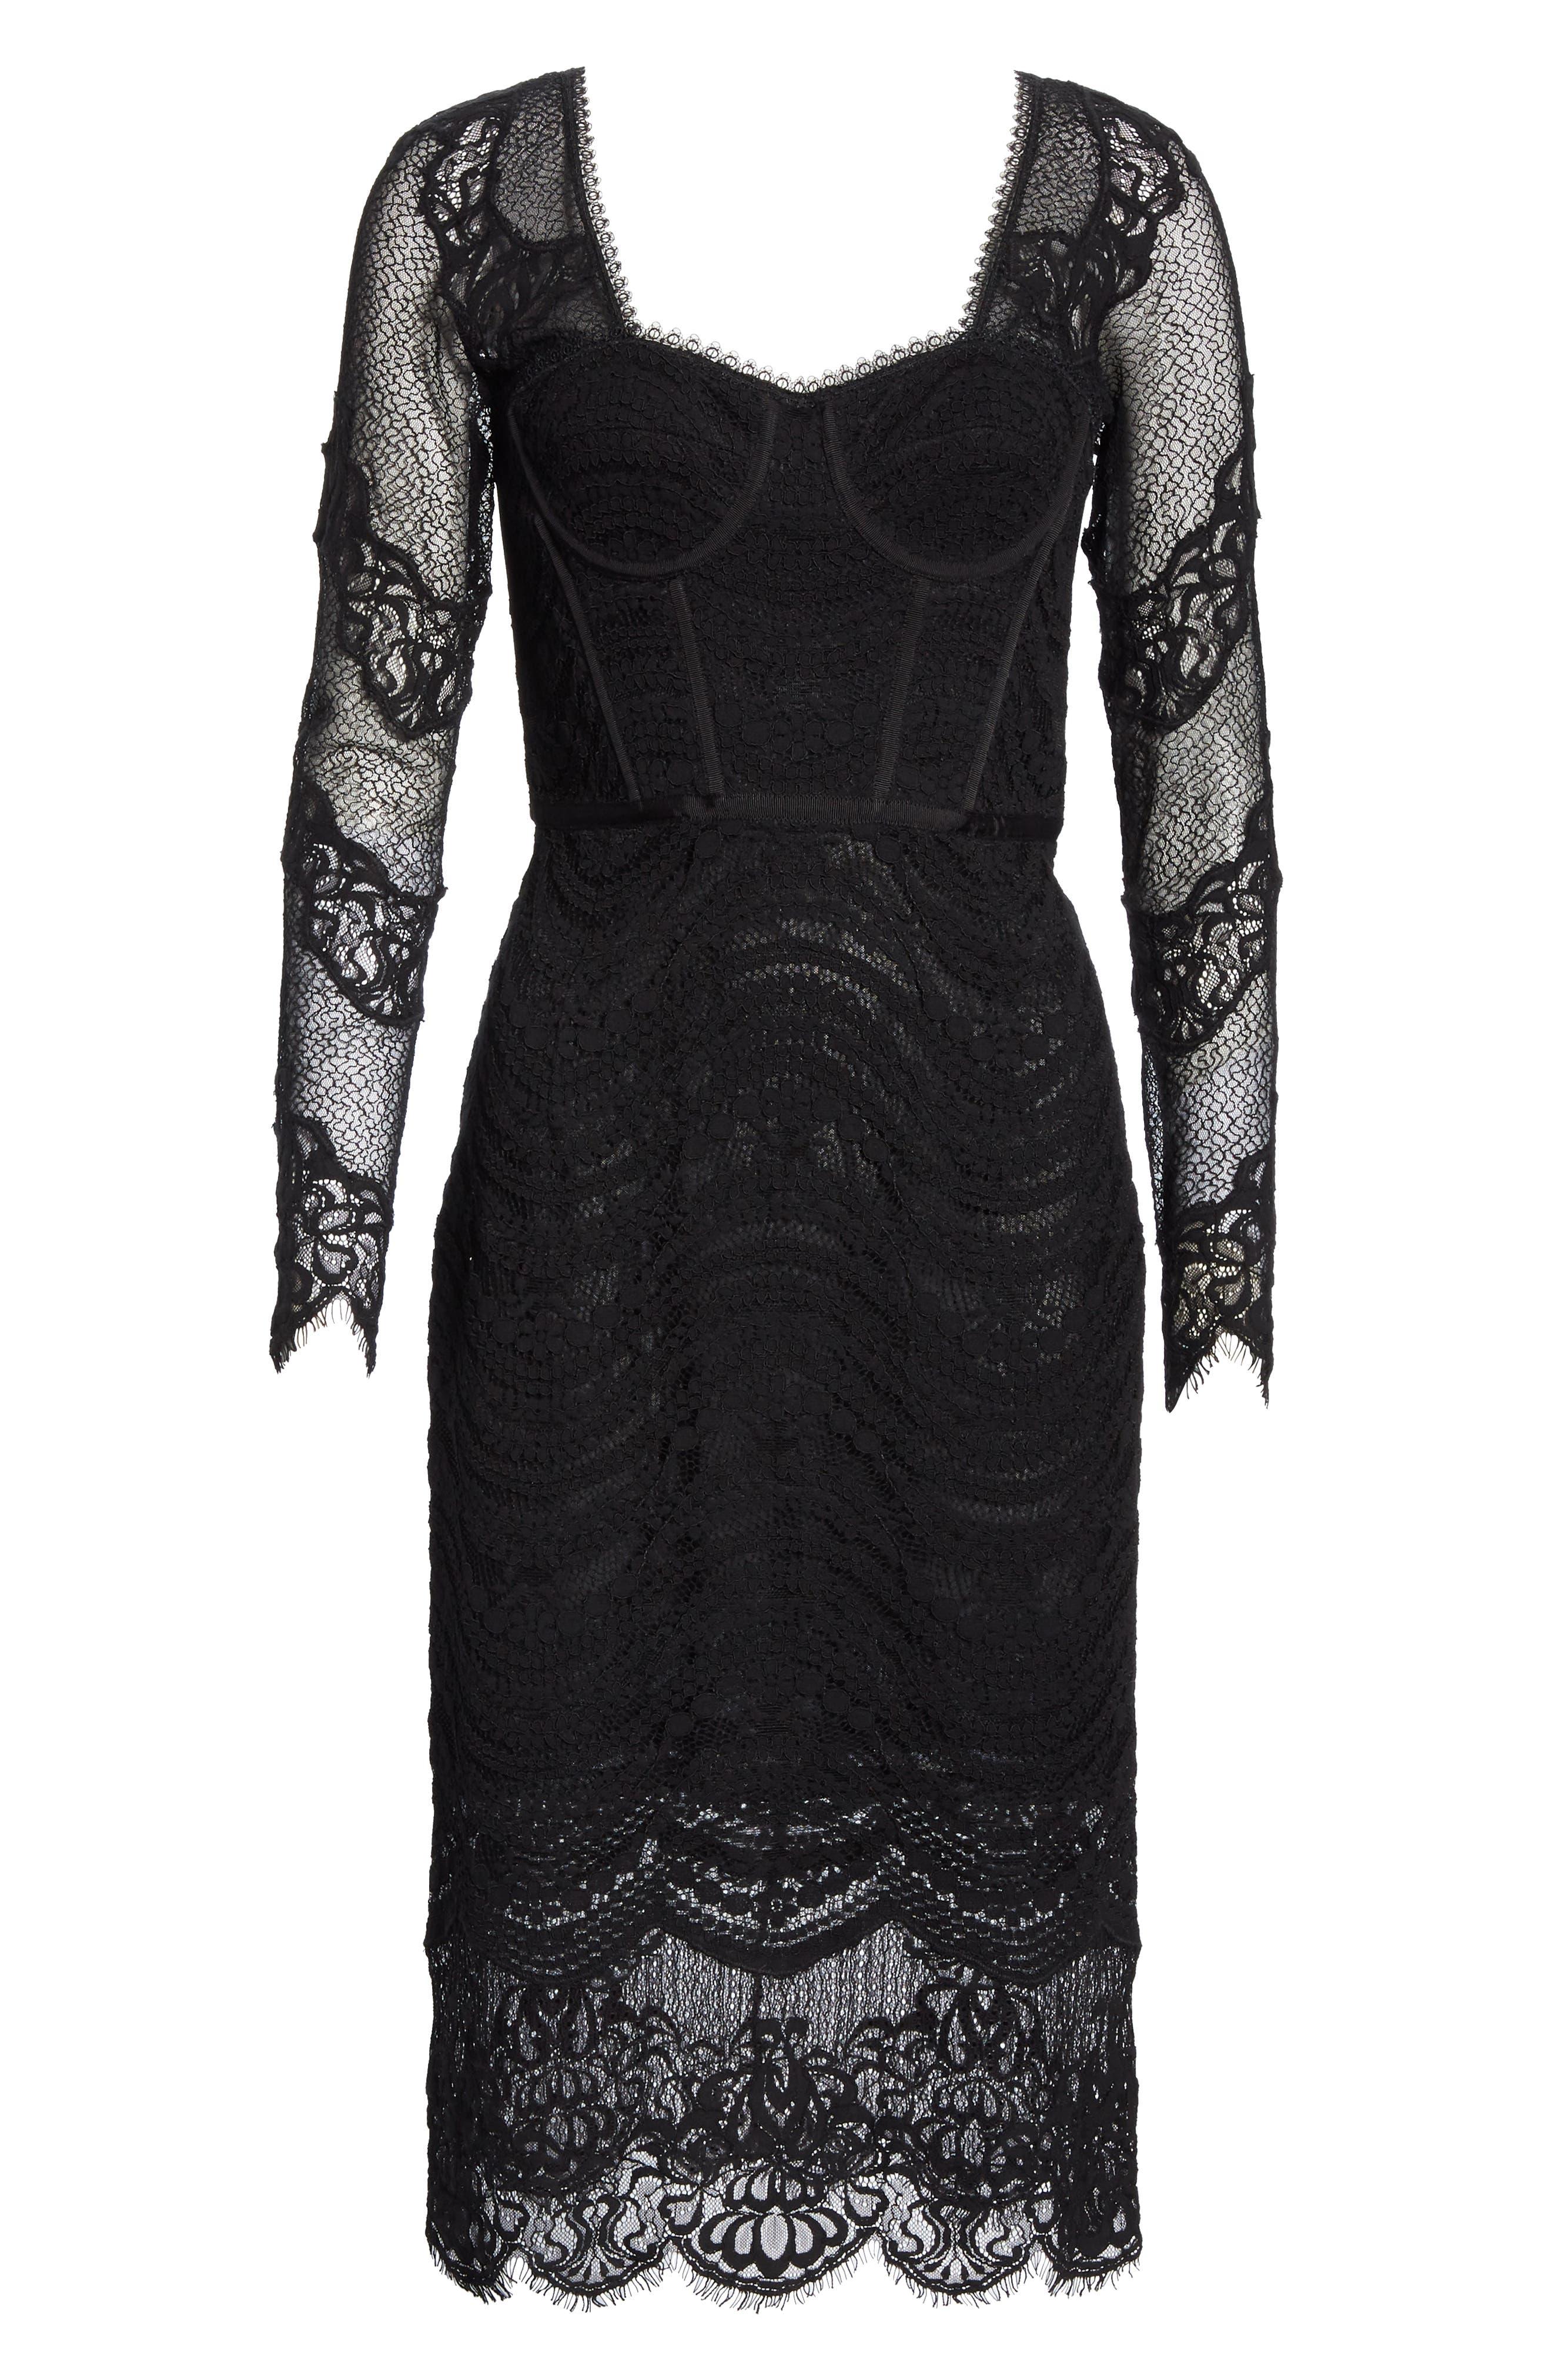 JONATHAN SIMKHAI,                             Lace Bustier Bodysuit Dress,                             Alternate thumbnail 7, color,                             BLACK